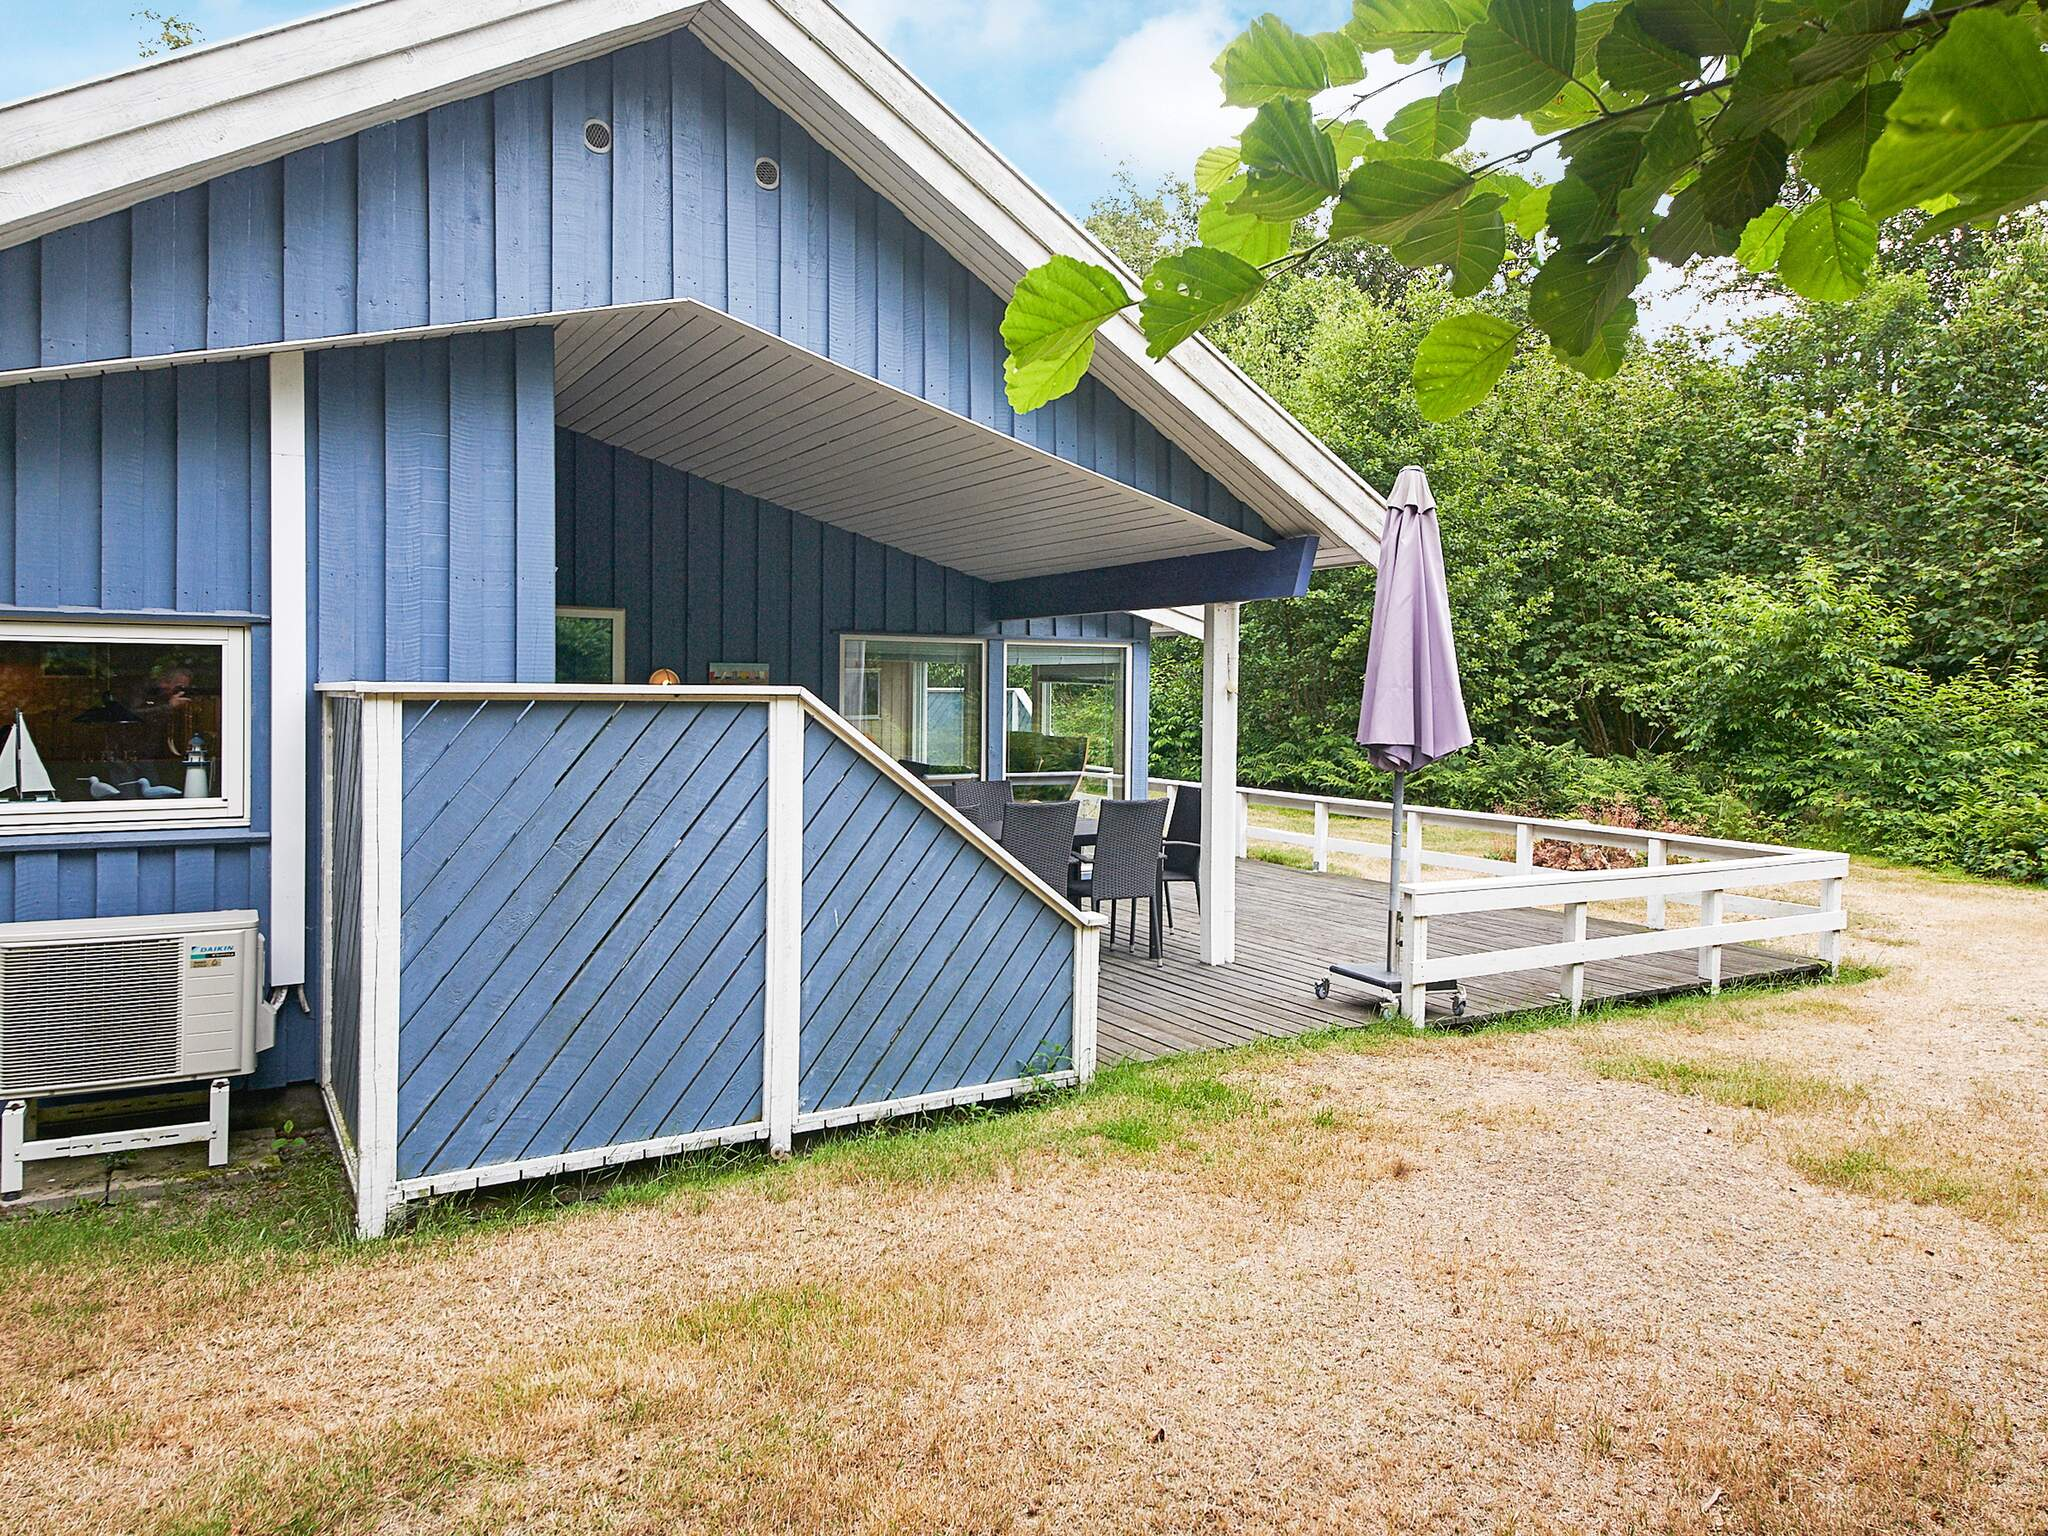 Maison de vacances Østre Sømarken (82551), Aakirkeby, , Bornholm, Danemark, image 15